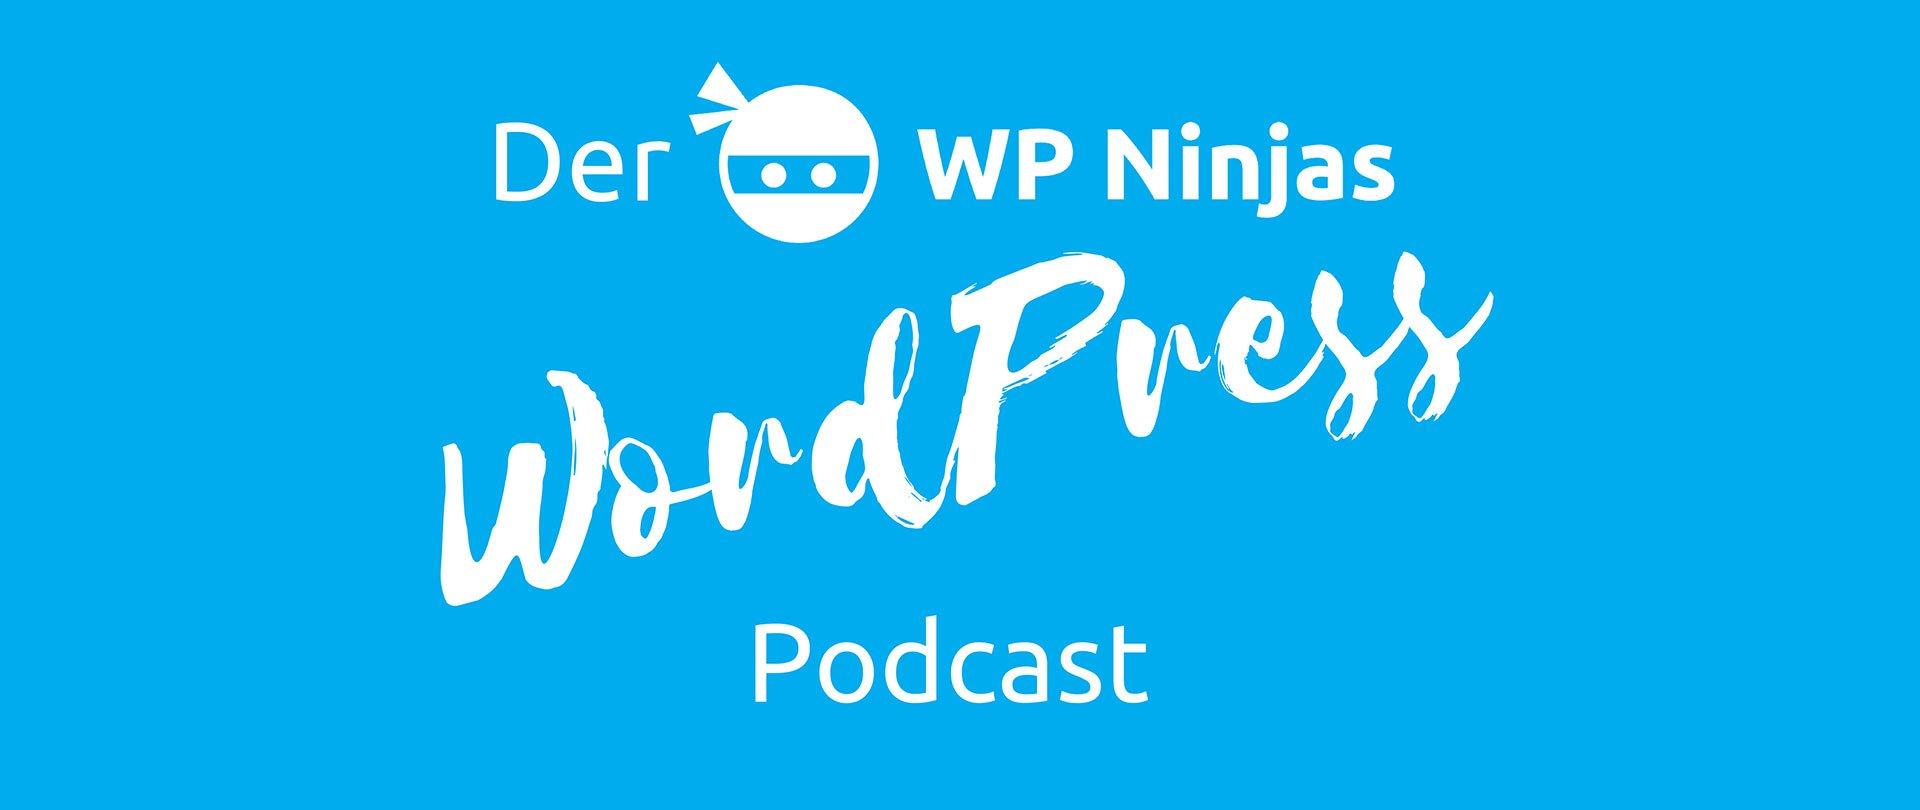 Der WP Ninjas WordPress Podcast